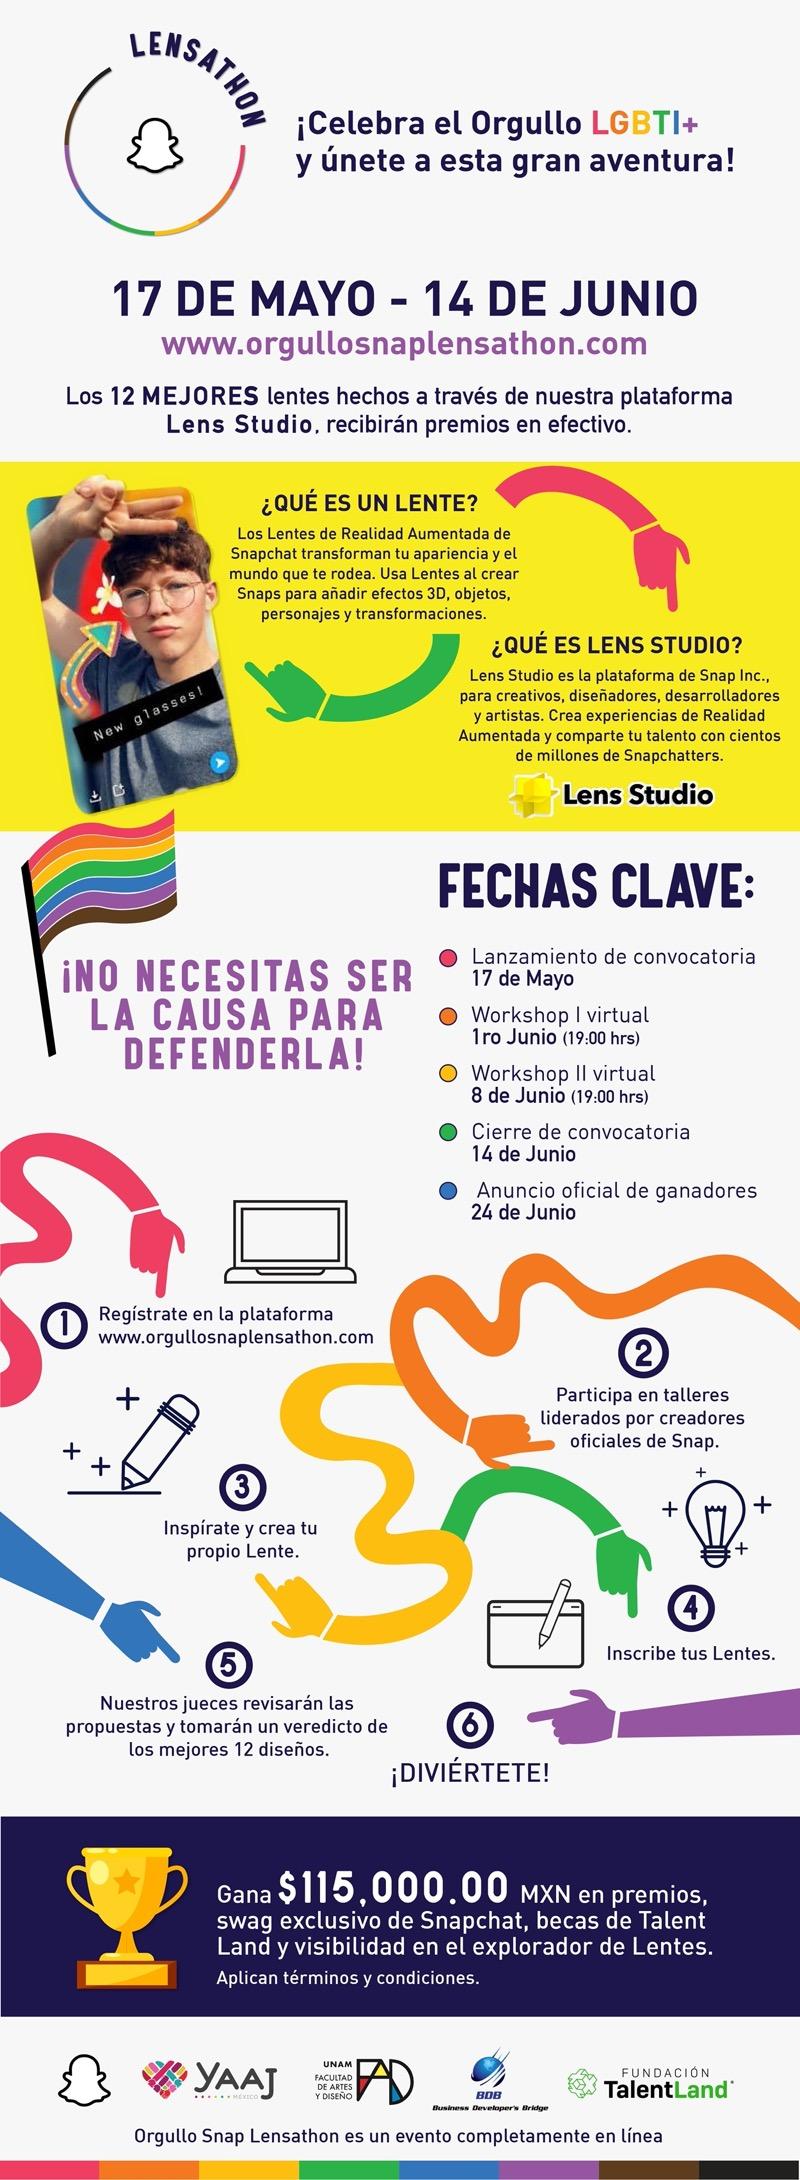 Snapchat lanza el primer Lensathon de Realidad Aumentada en México - infografia-snapchat-lensathon-2021